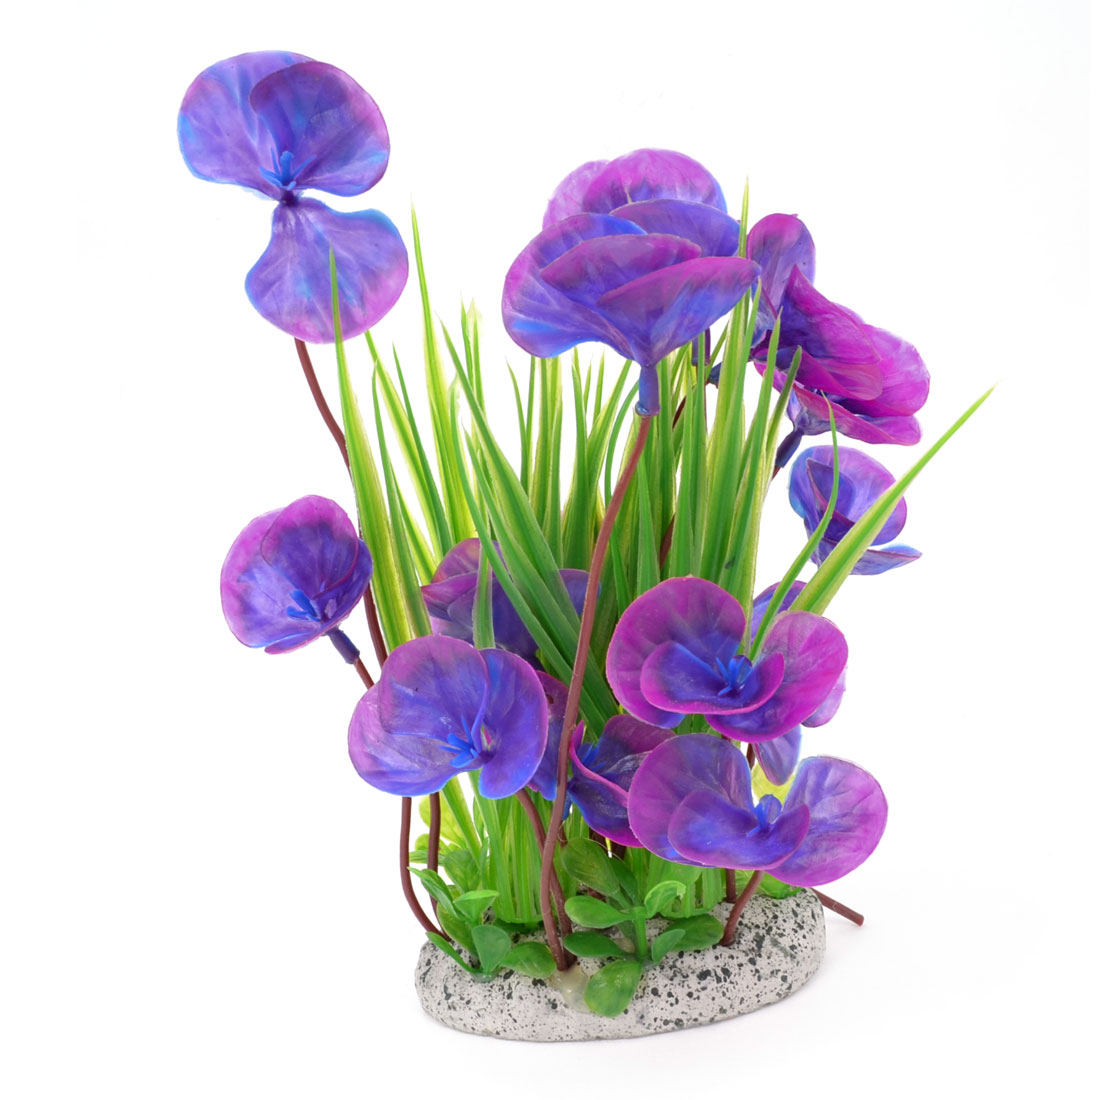 "Purple Green Plastic Ceramic Base Emulation Aquatic Plant Grass Tree 8.3"" Height for Fish Tank"